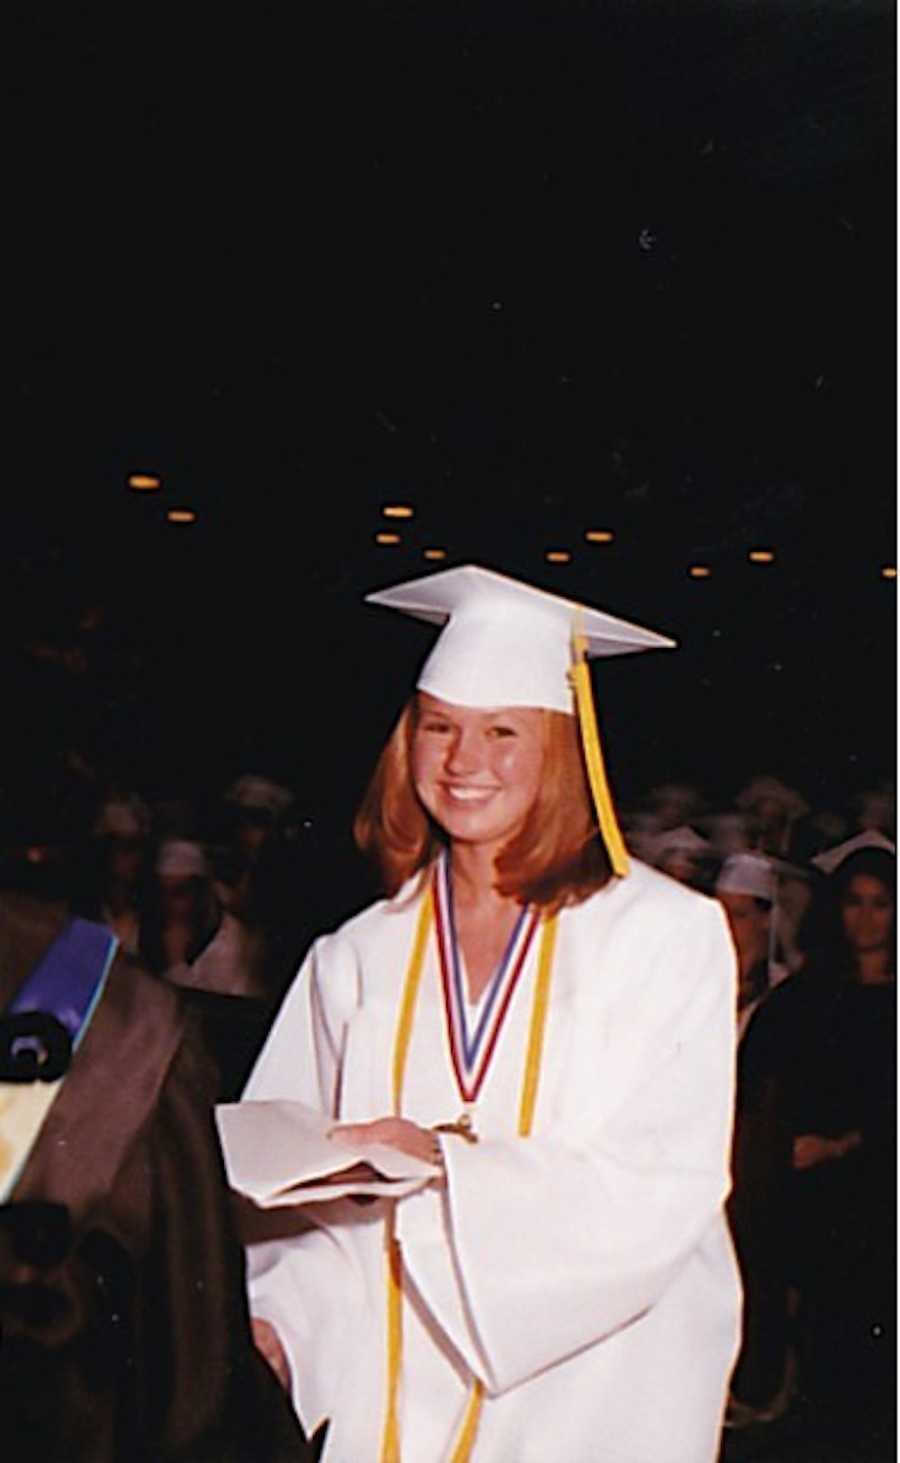 Teen's high school graduation